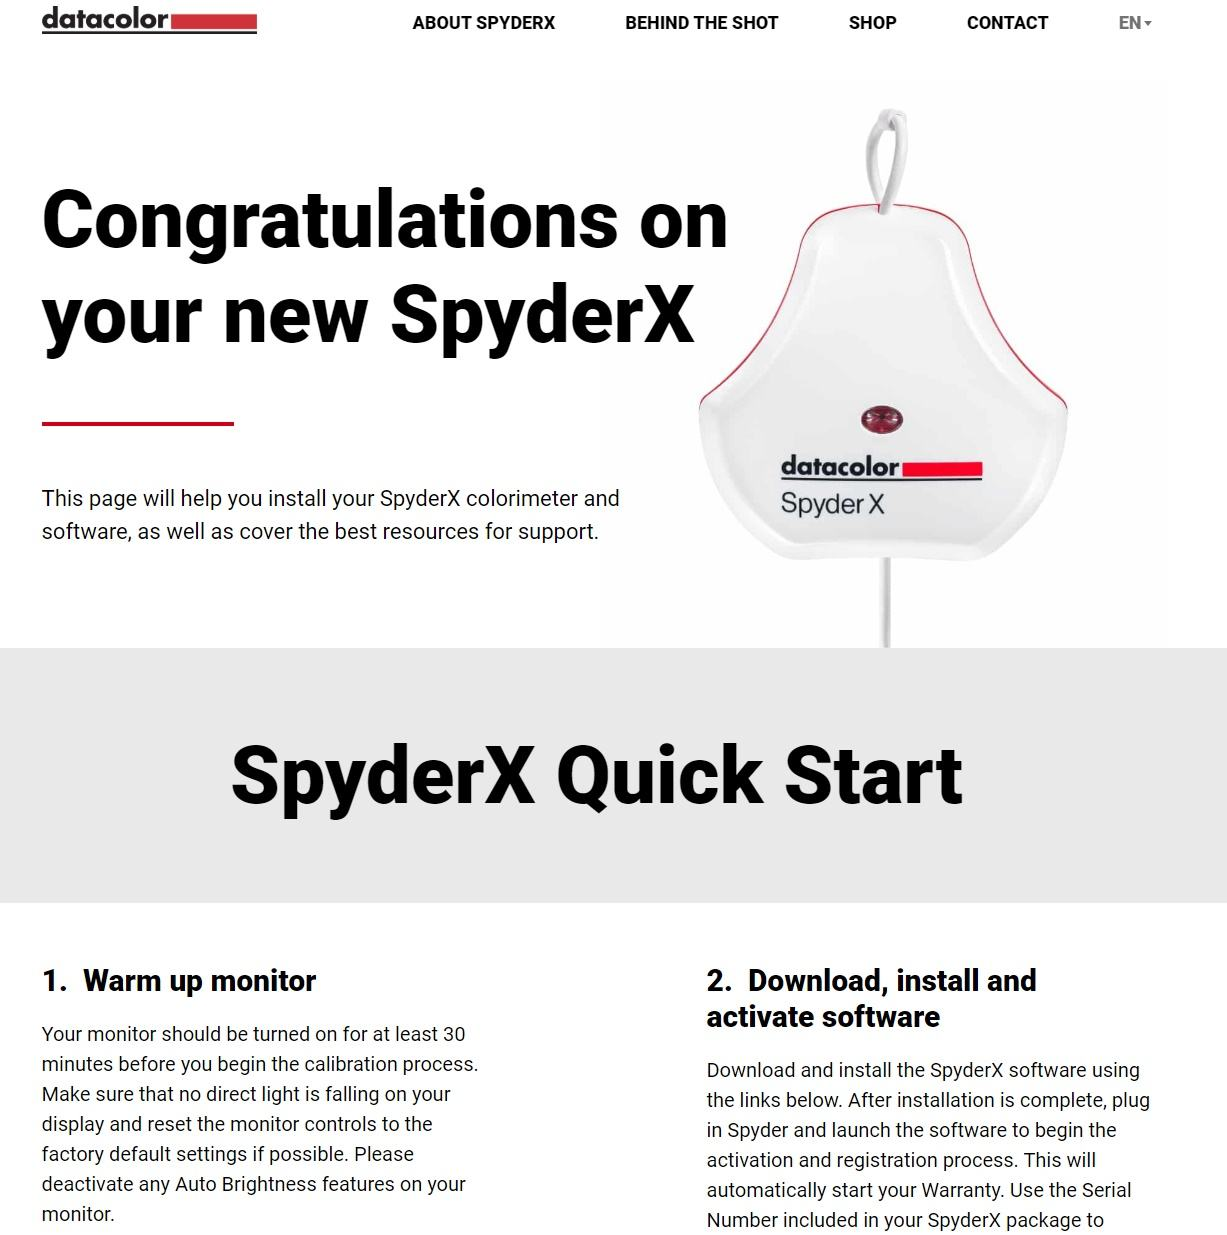 Datacolor Spyder X page 1